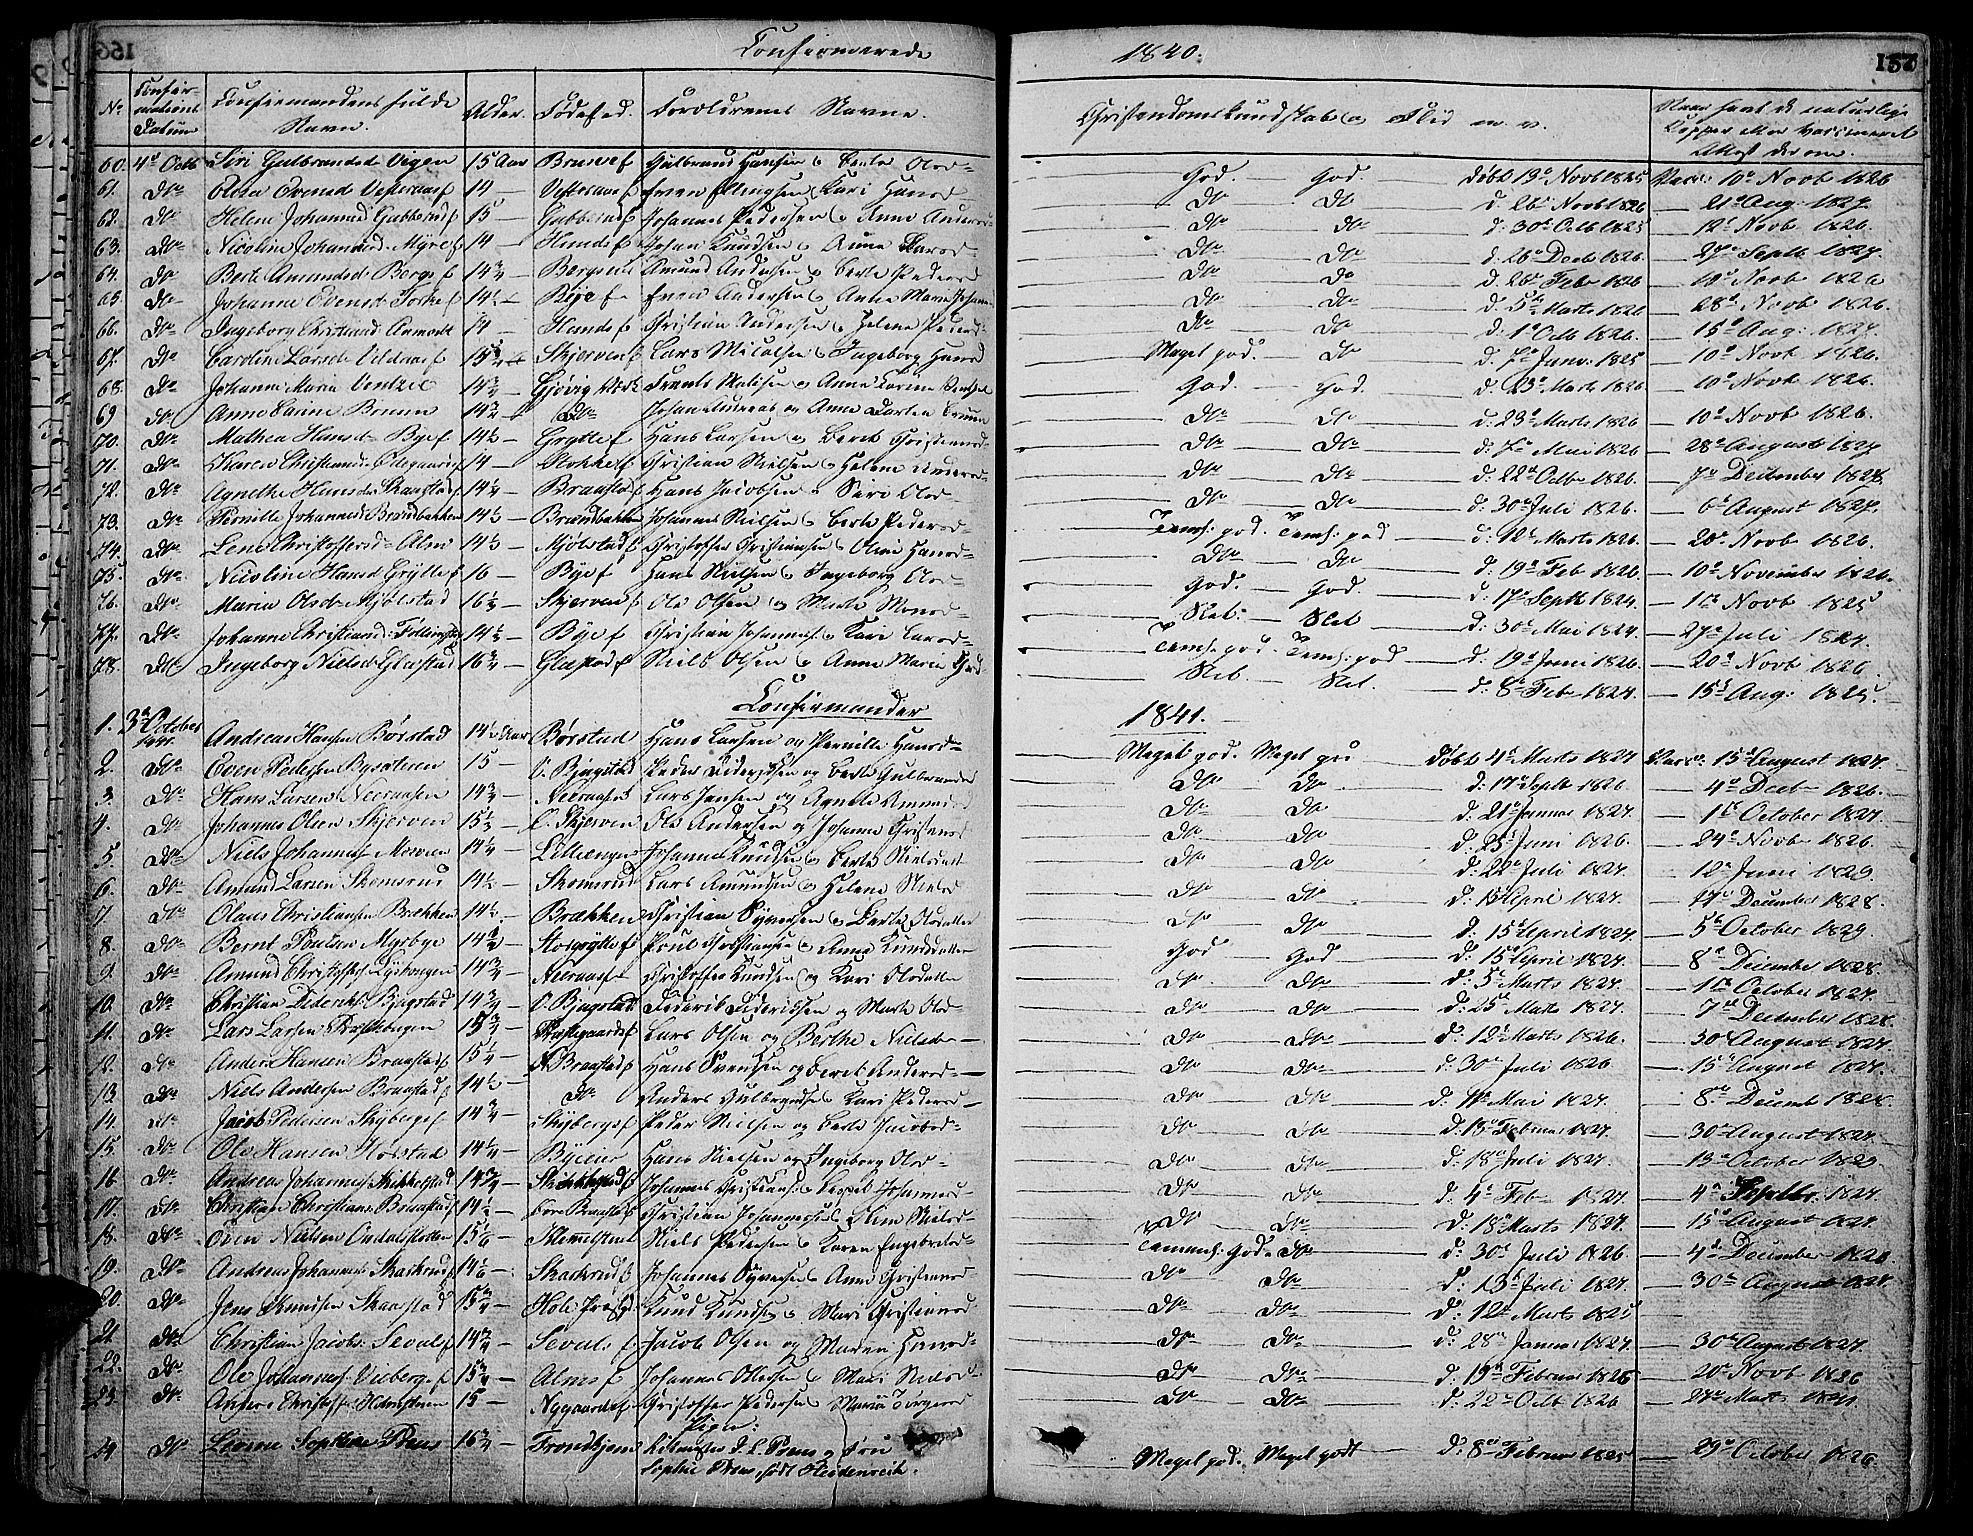 SAH, Vardal prestekontor, H/Ha/Hab/L0004: Klokkerbok nr. 4, 1831-1853, s. 157